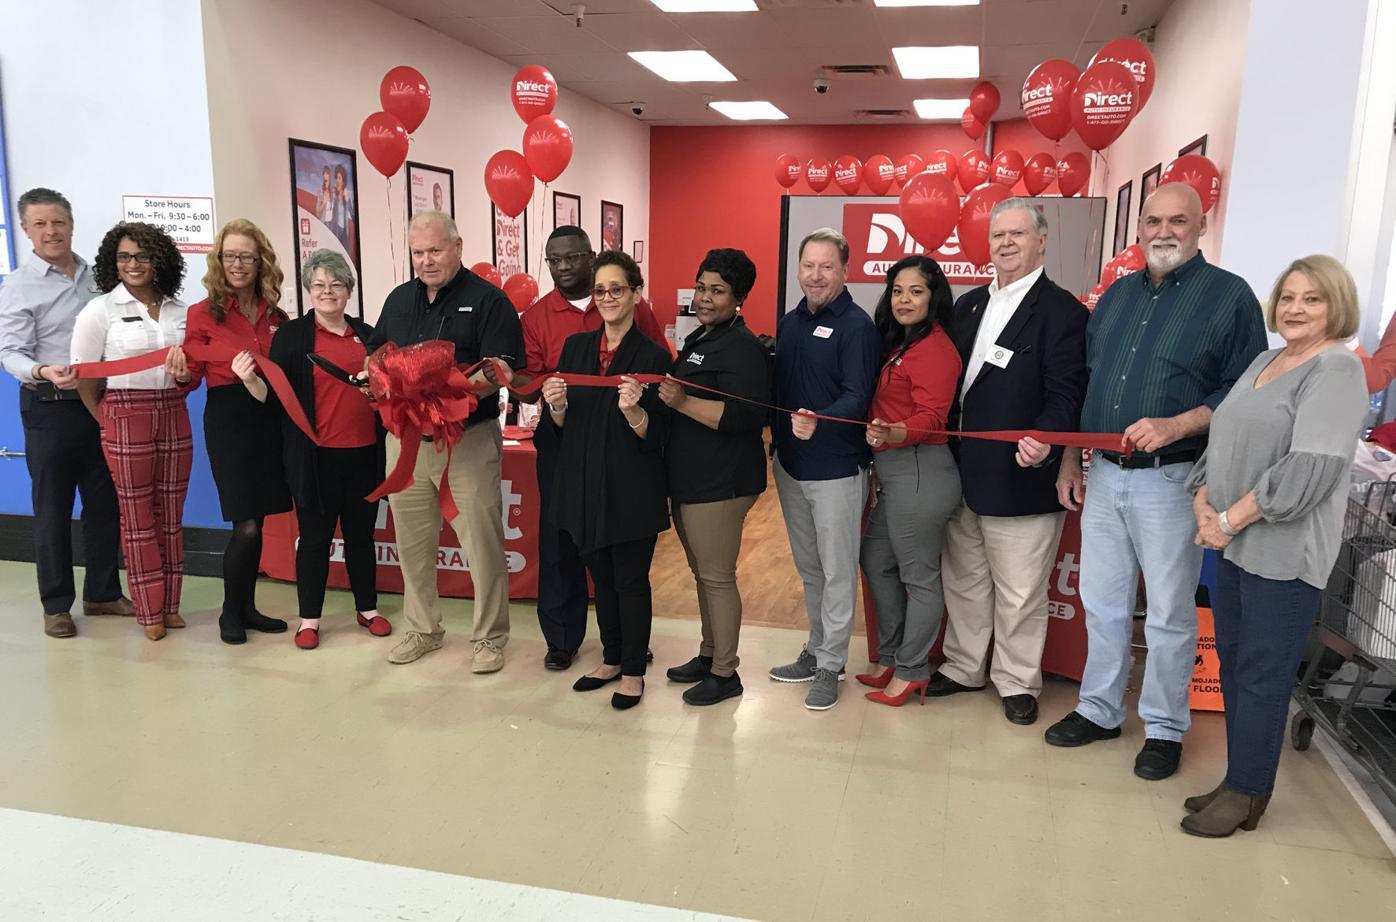 Ucda Hosts Ribbon Cutting For Direct Auto Insurance New Albany Djournal Com